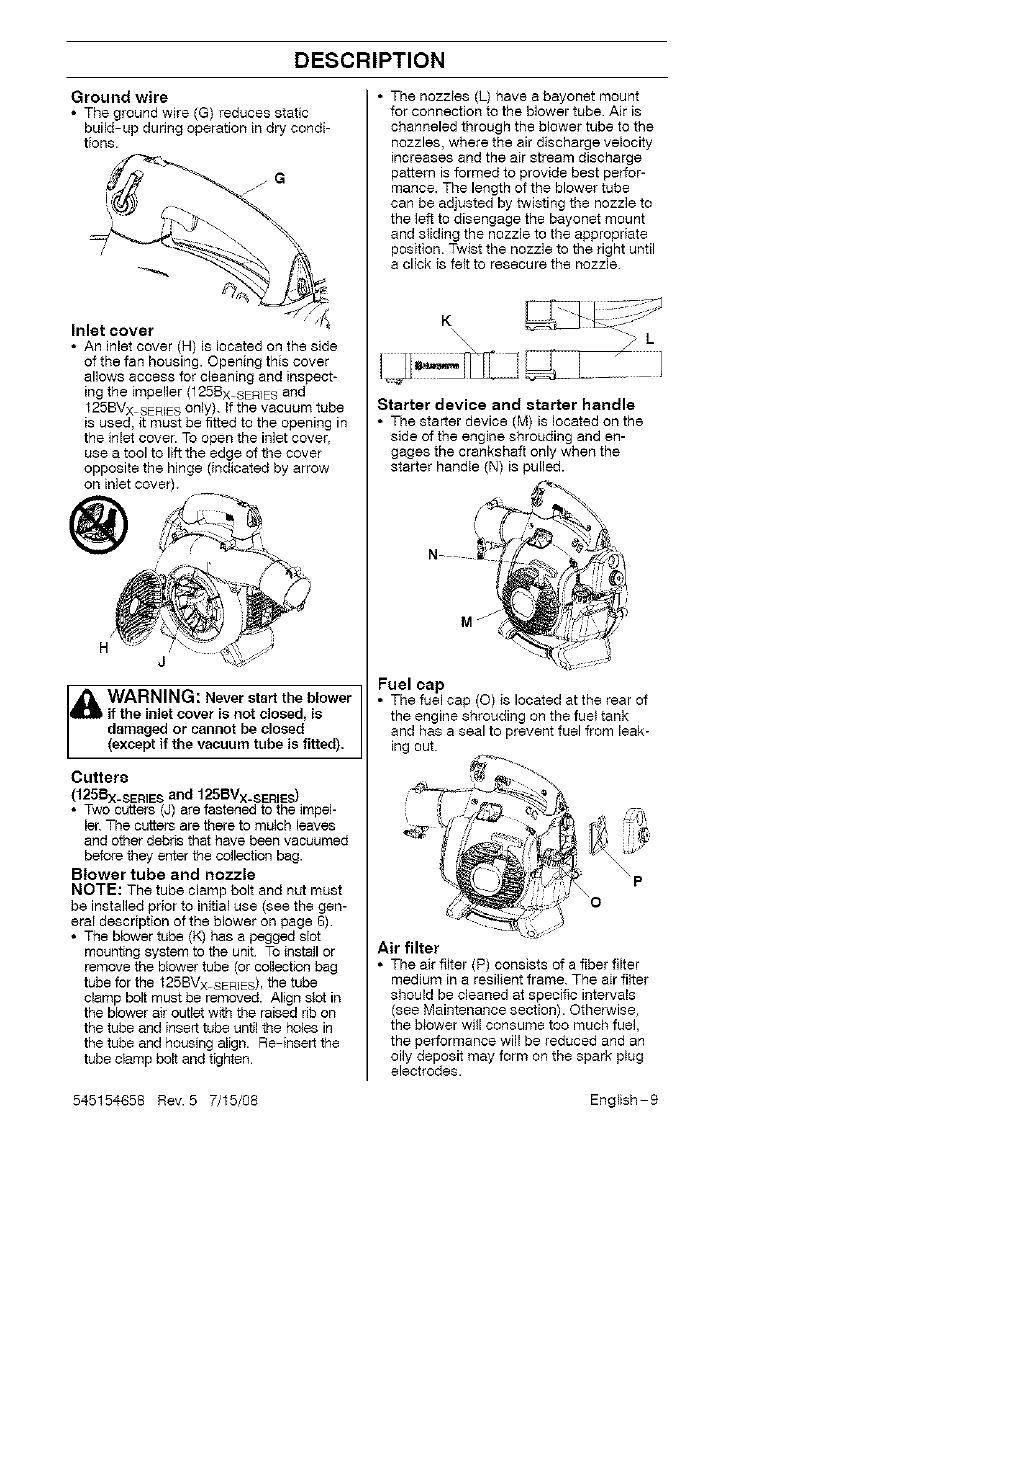 Husqvarna 125BV User Manual BLOWER Manuals And Guides L0808004